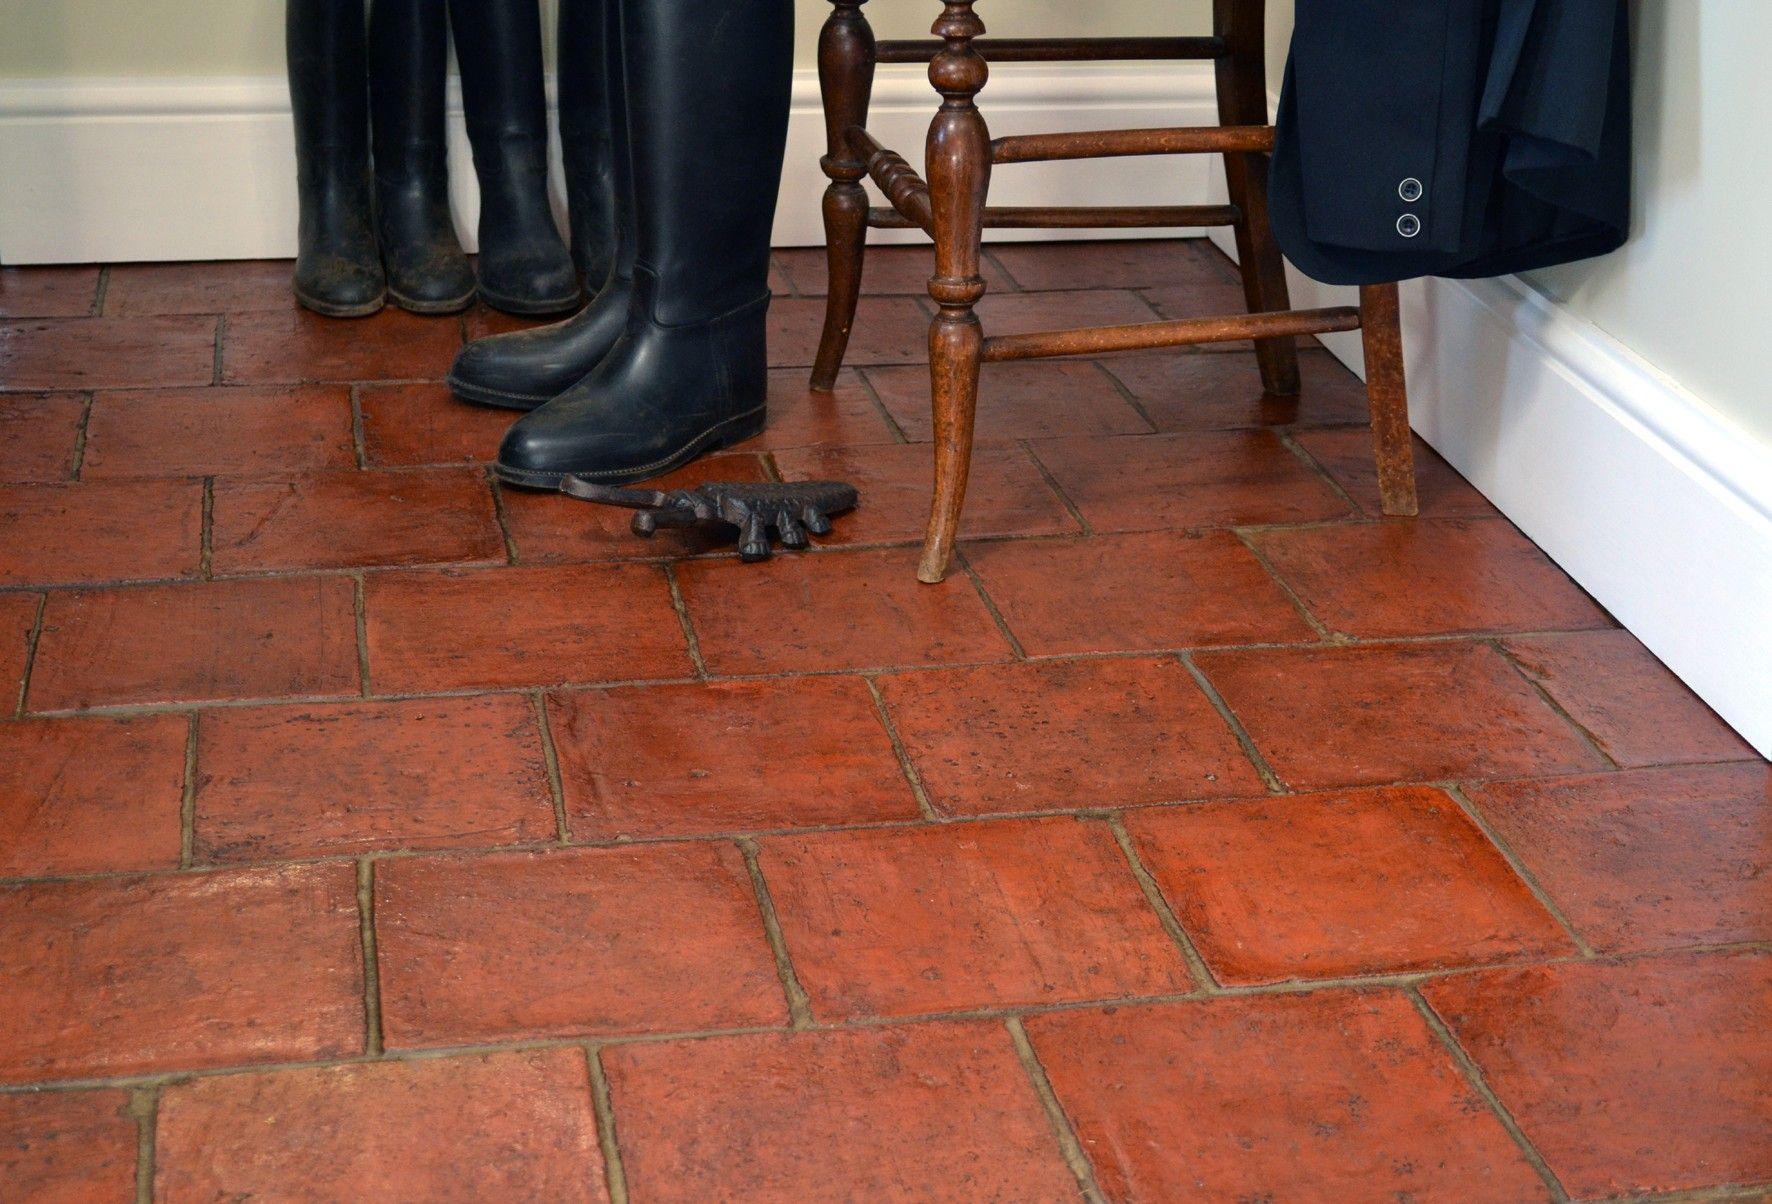 handmade rustic terracotta | terracotta tile, parisian chic decor